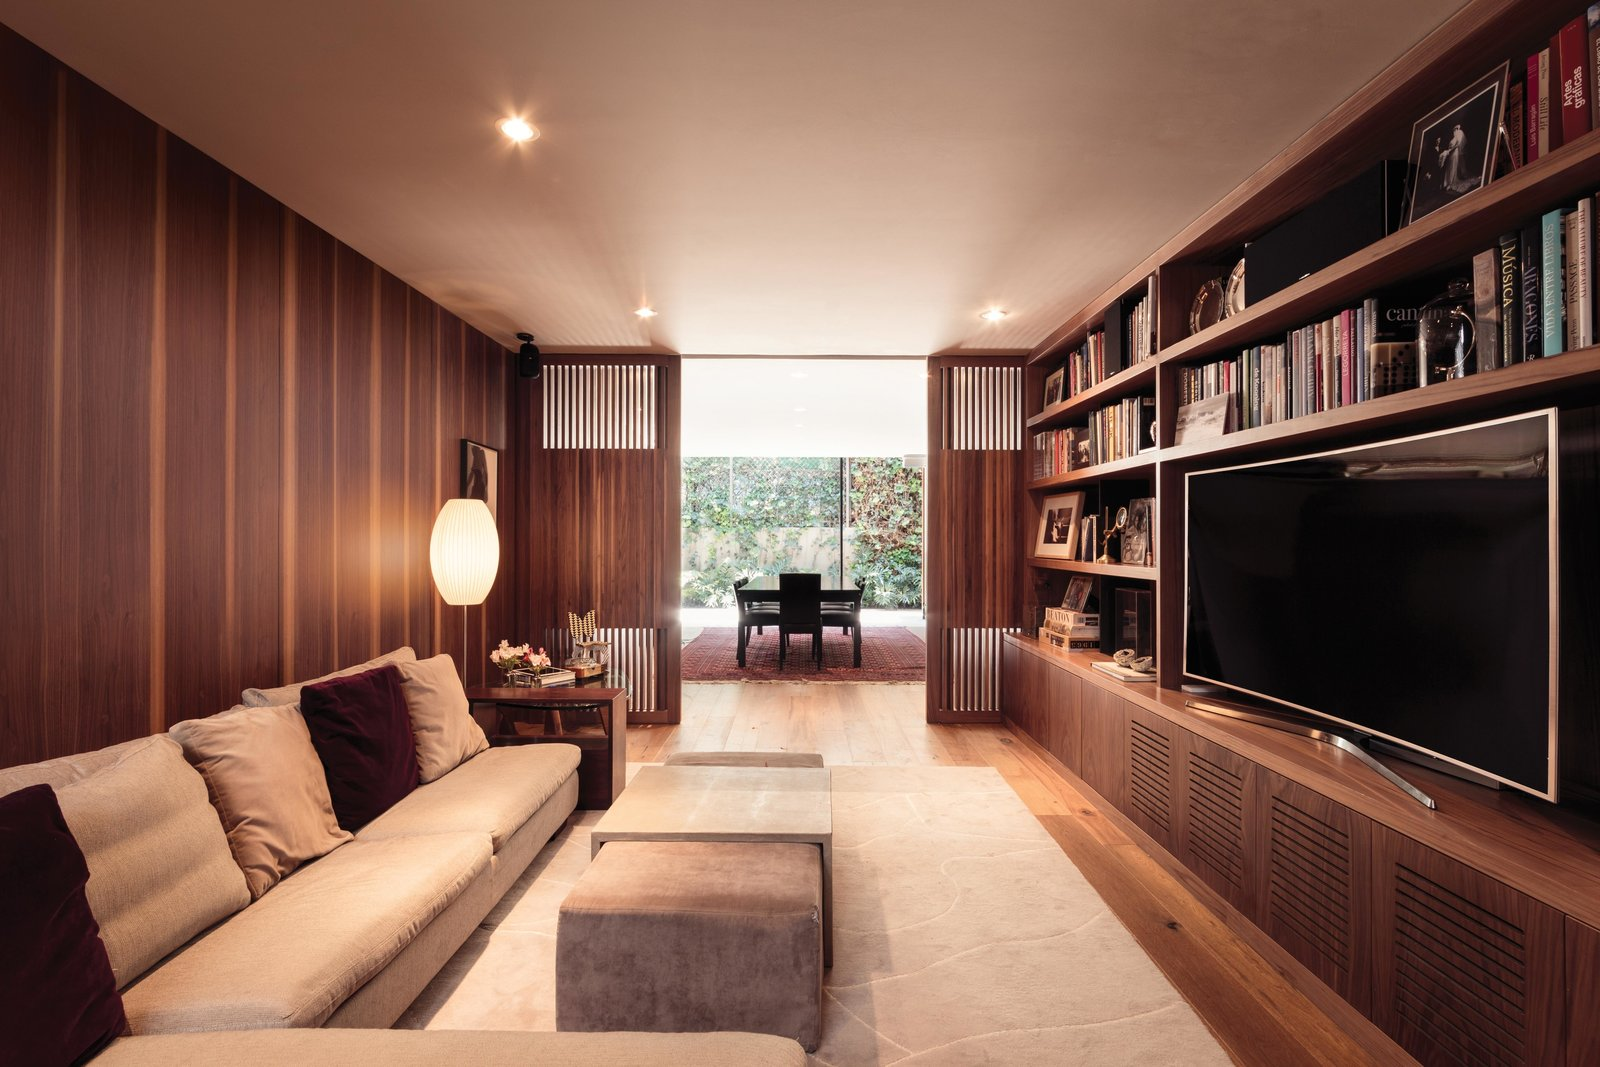 Living Room, Sofa, Coffee Tables, and Medium Hardwood Floor  Photos from Sierra Fria House